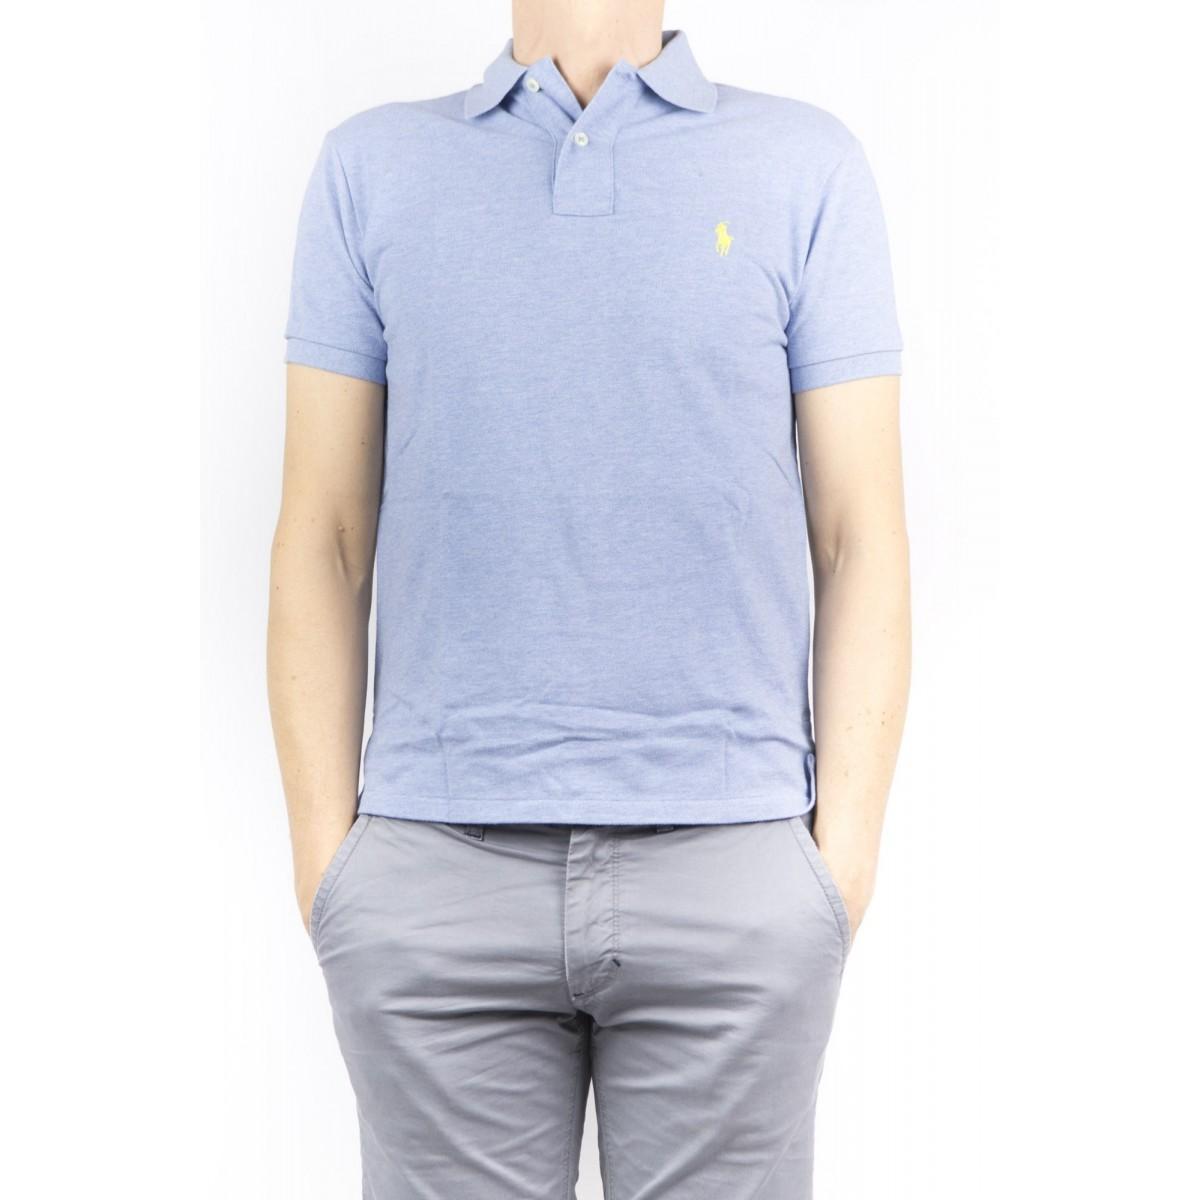 Polo Ralph Lauren Man - A12Kaa09C8312 A41JH - melange azzurro